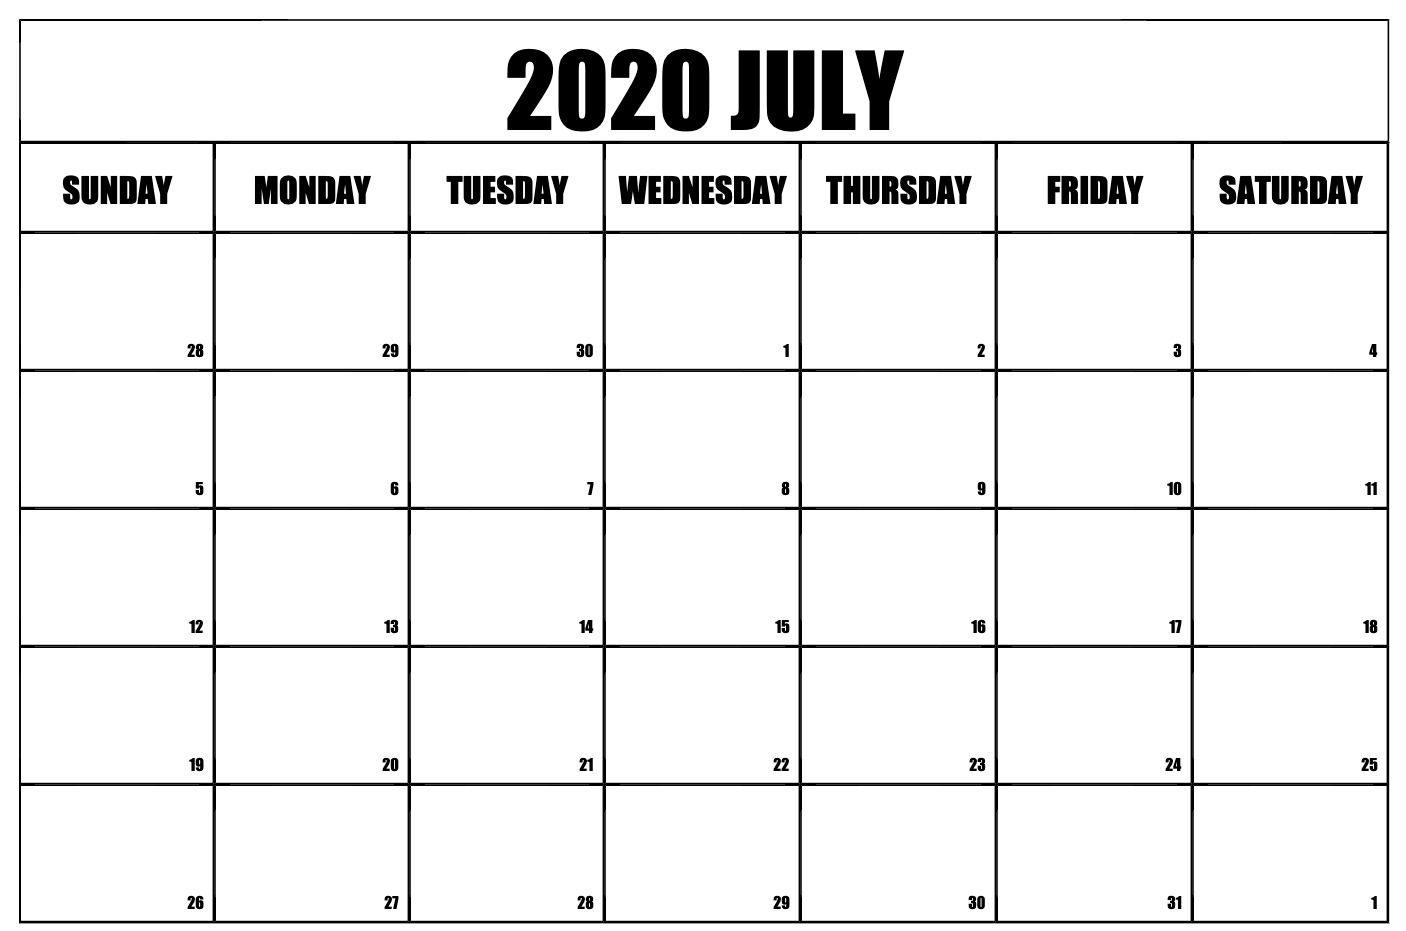 Free Printable July 2020 Calendar   Free Printable Calendar with regard to 2020 Printable Calendar Sunday To Saturday